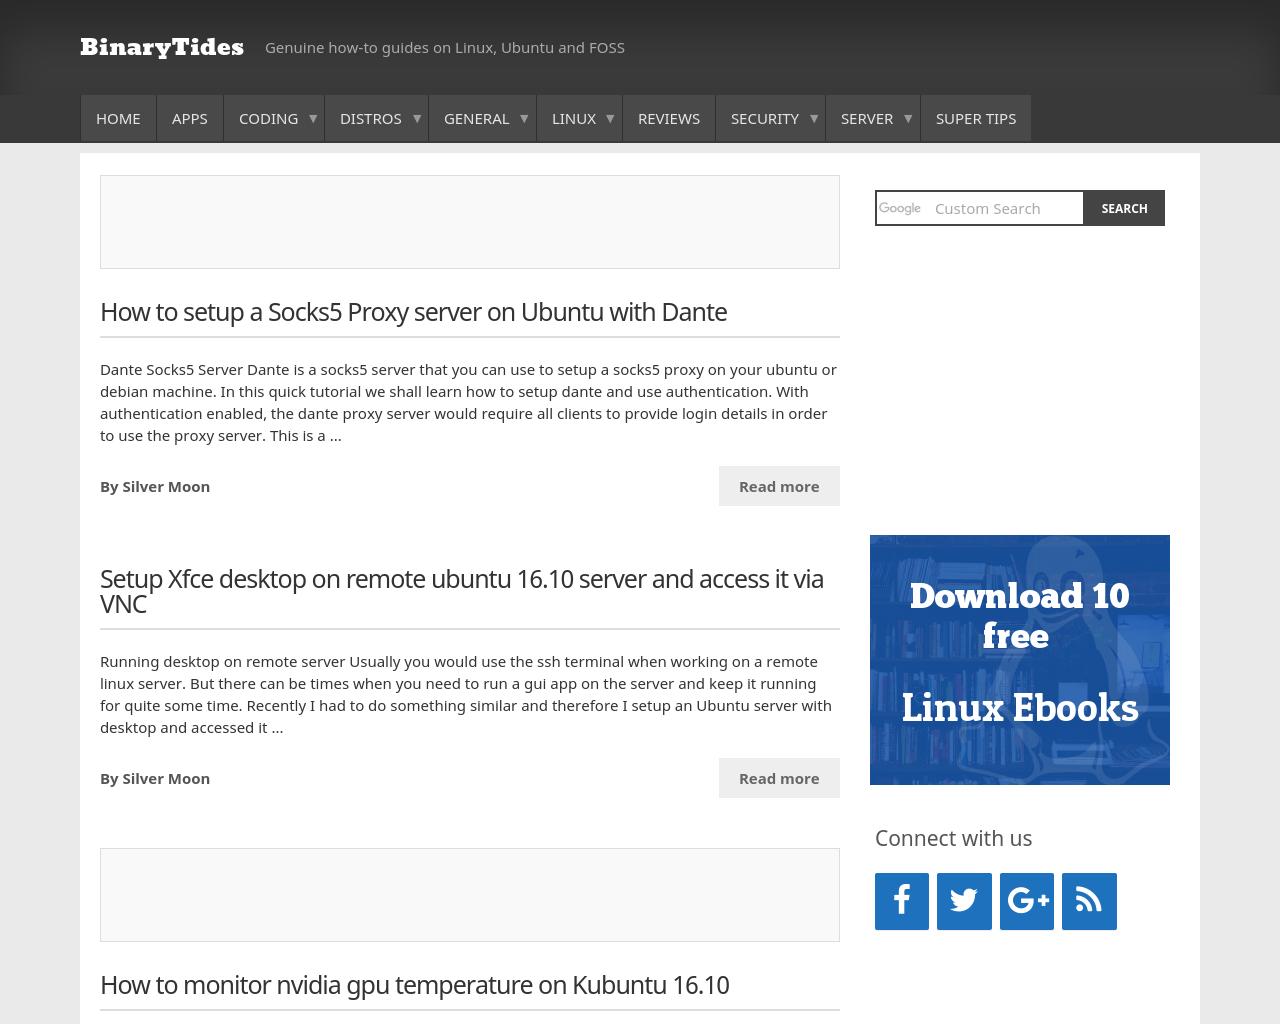 BinaryTides-Advertising-Reviews-Pricing